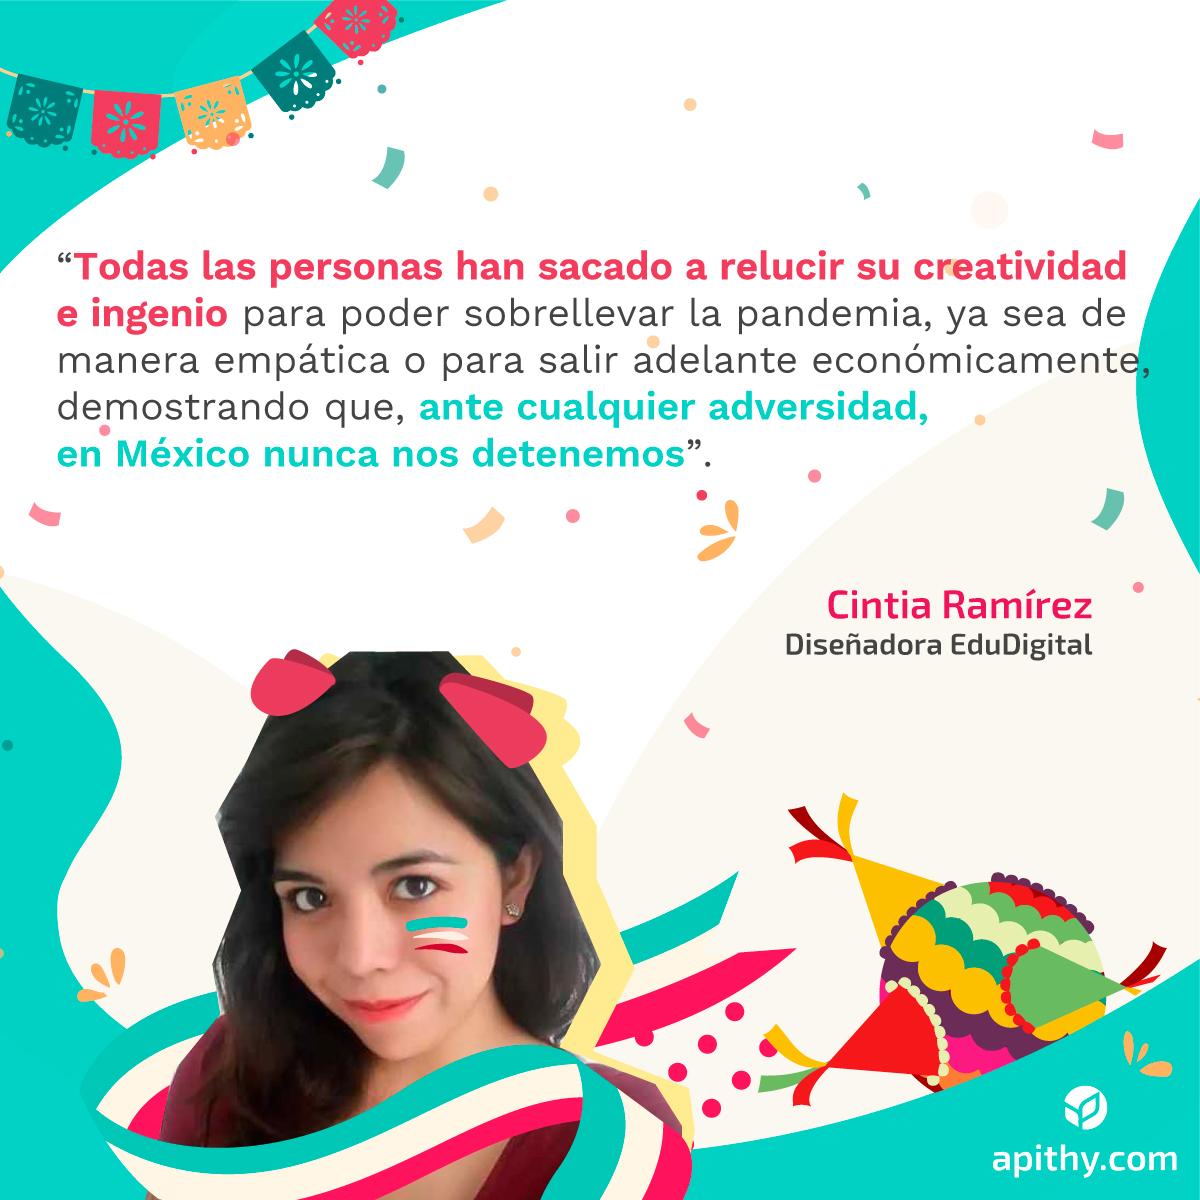 01 Cintia Ramírez